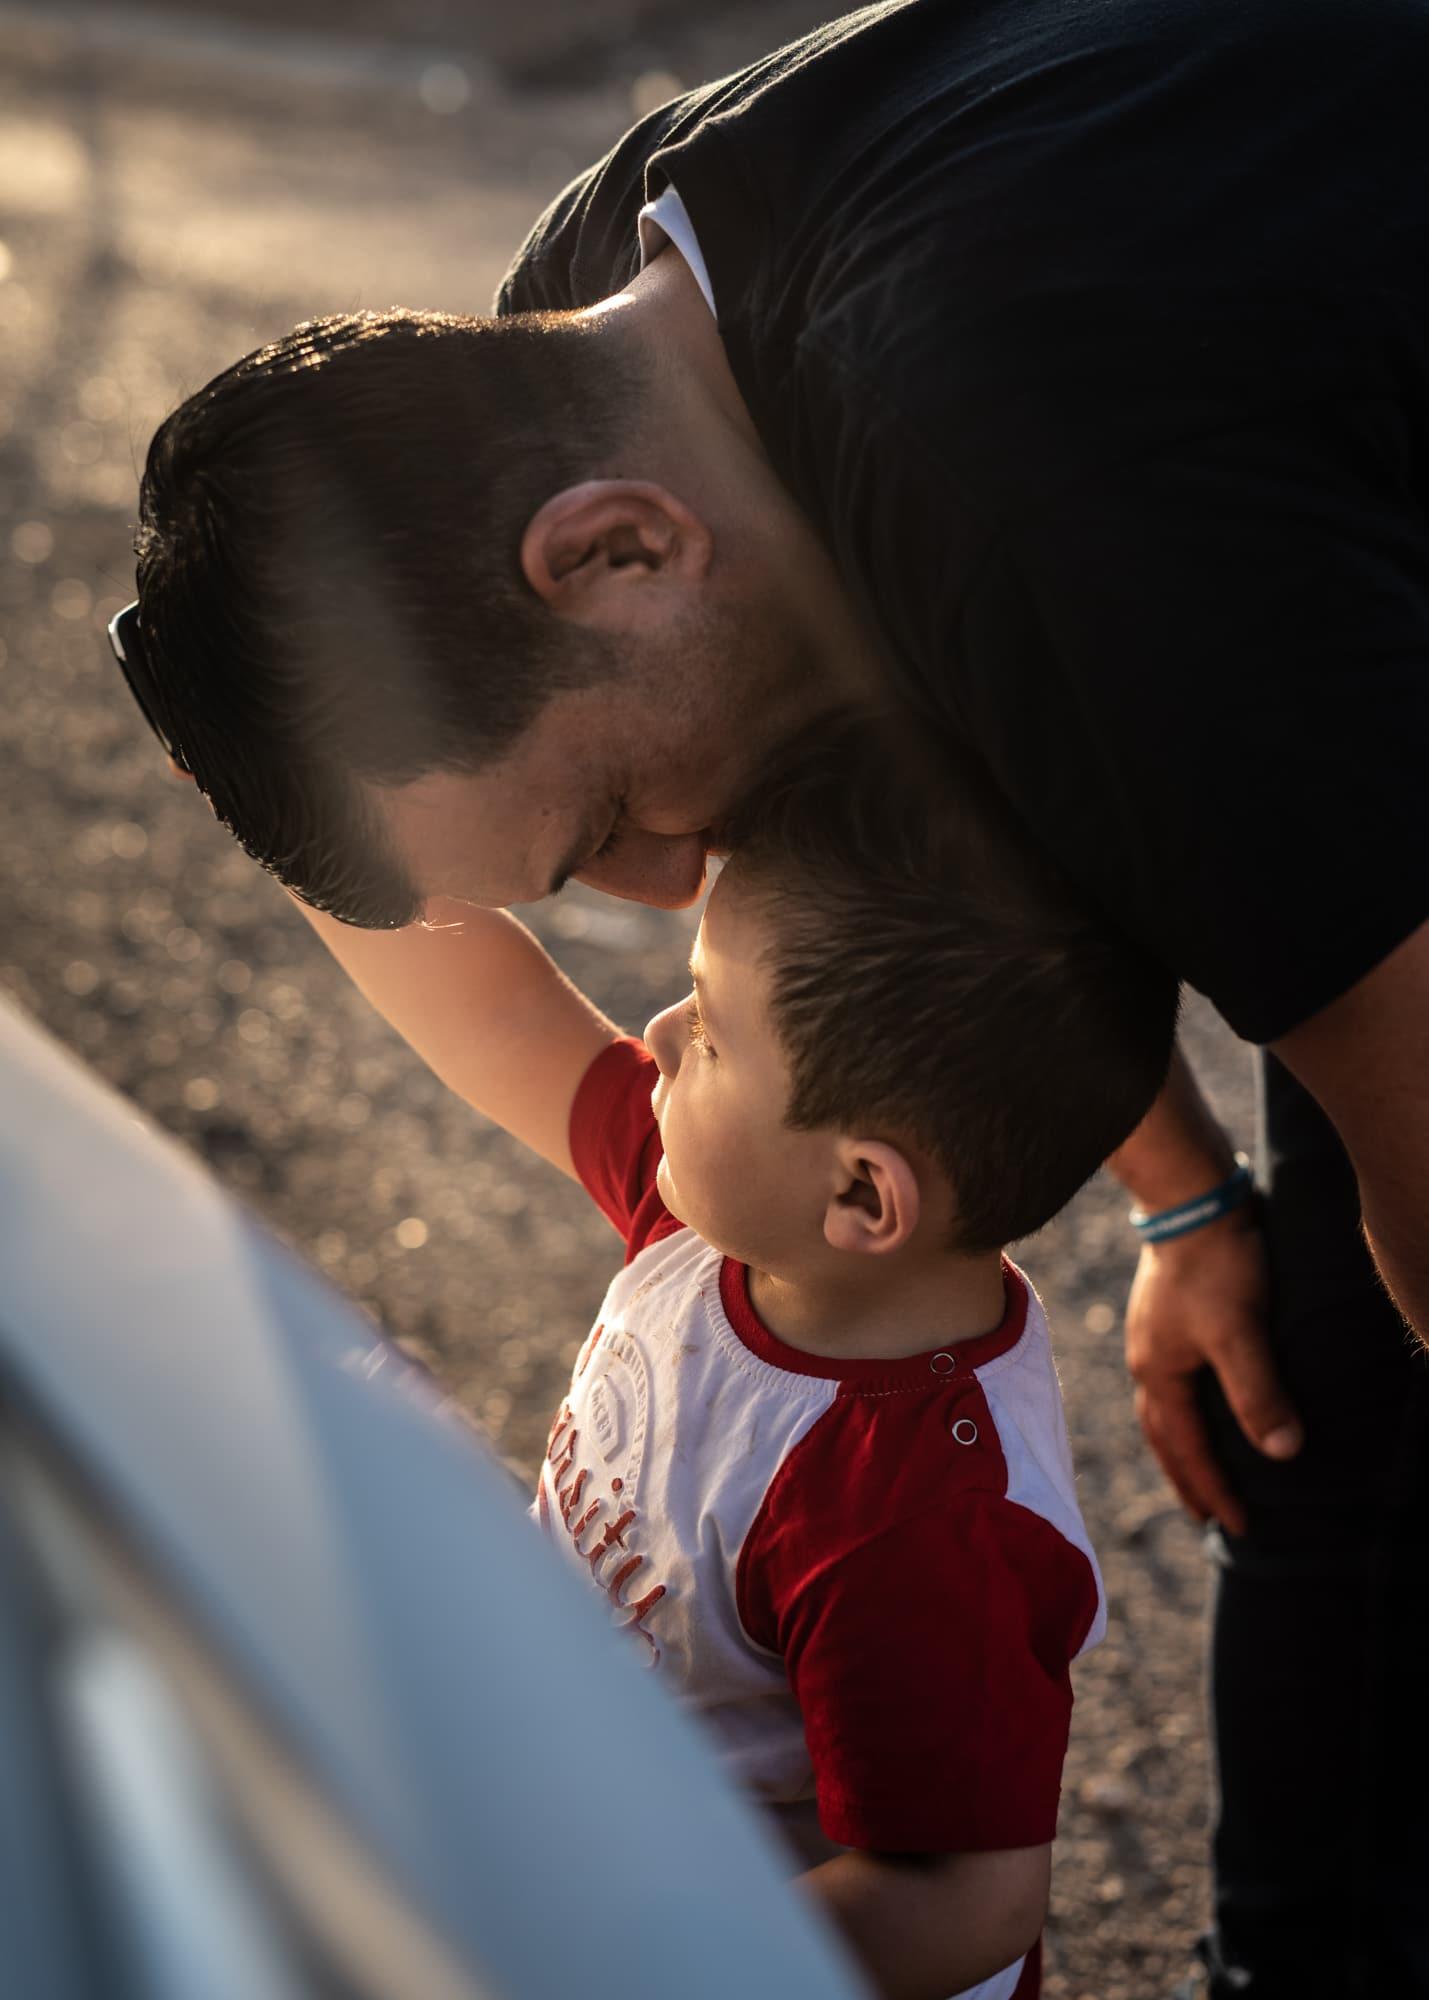 Abdullah Kurdi caresses Mirhad, son of a friend at Gawilan refugee camp, Iraq, on Sept 2nd, 2019.